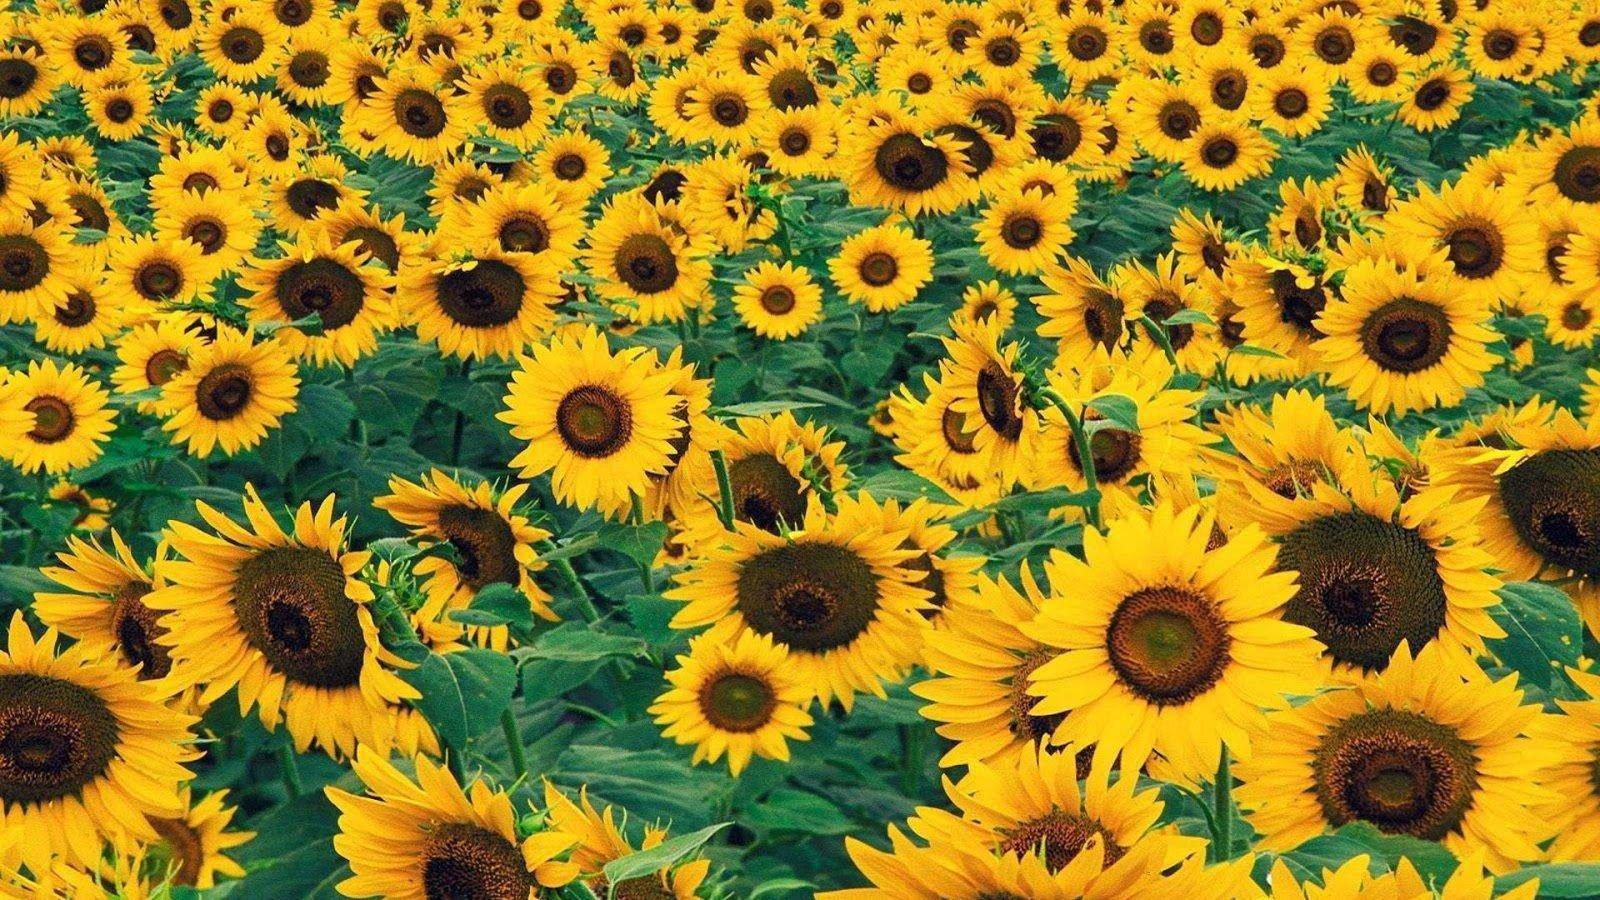 Free Download Sunflower Wallpaper Id 226532 Hd 1600x900 For Desktop